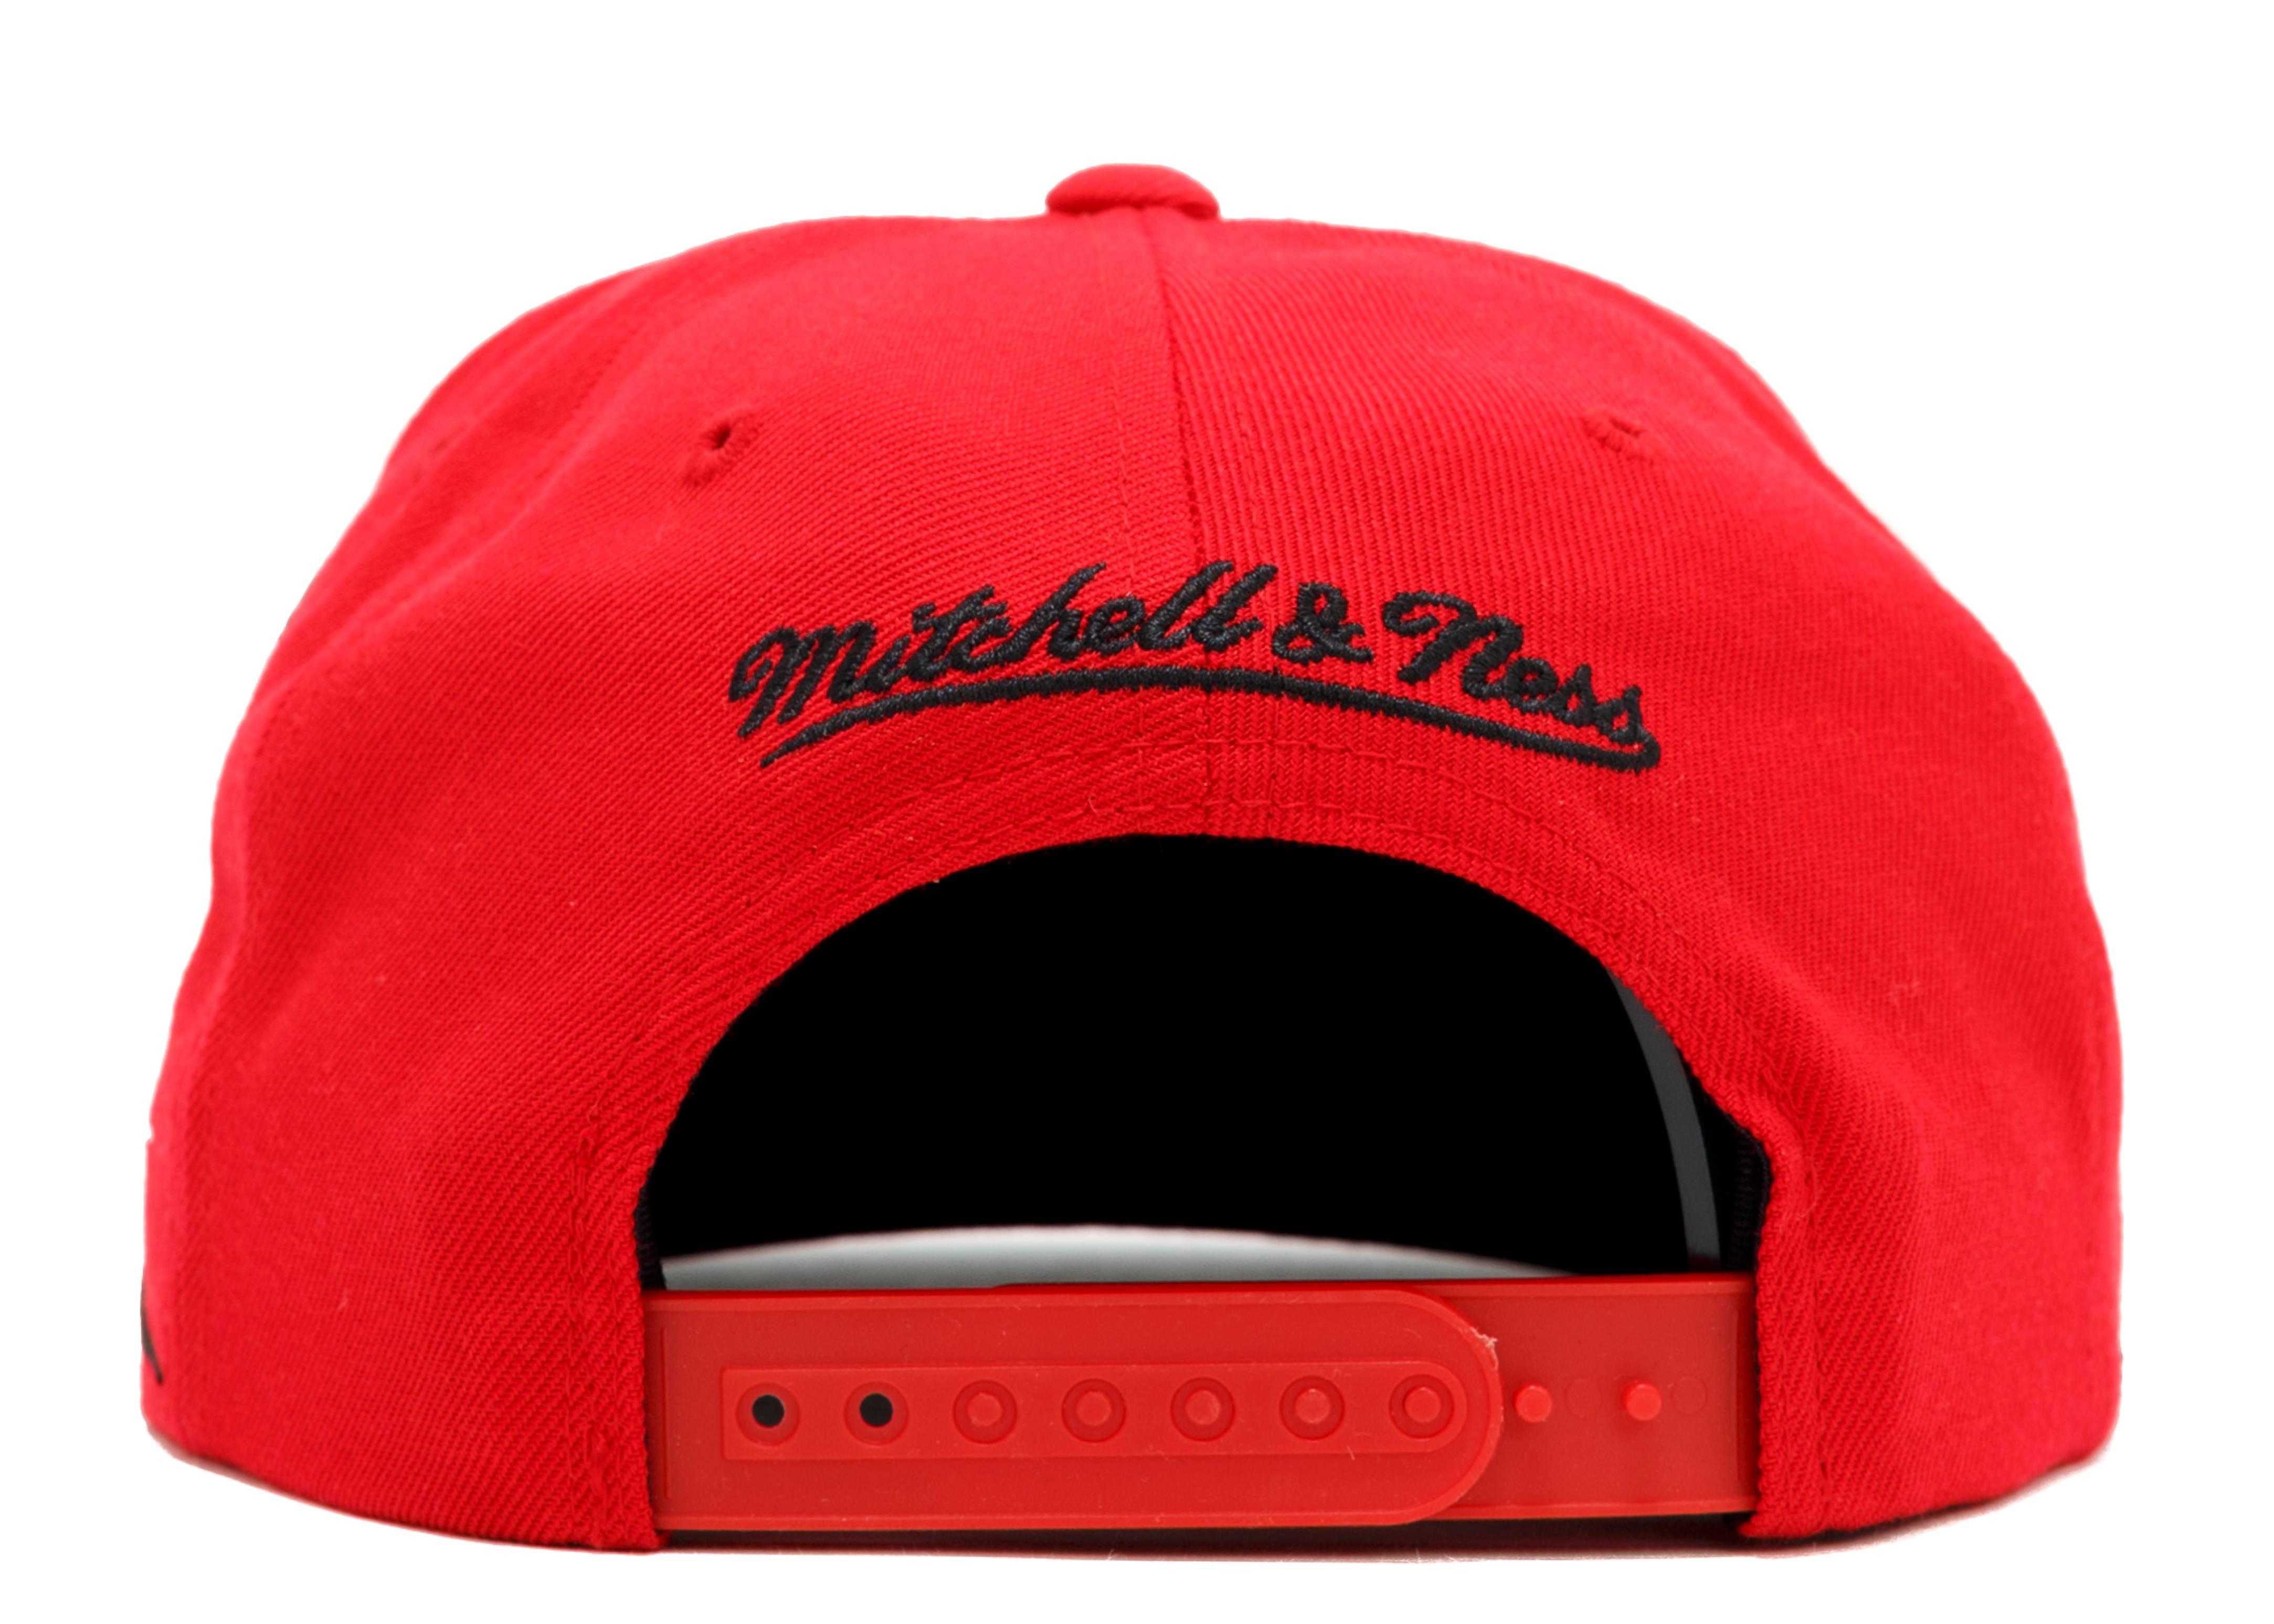 promo code 1e713 146ad Chicago Blackhawks Diamond Snap-back - Mitchell   Ness - vr10mtc7hawks - red black-white    Flight Club